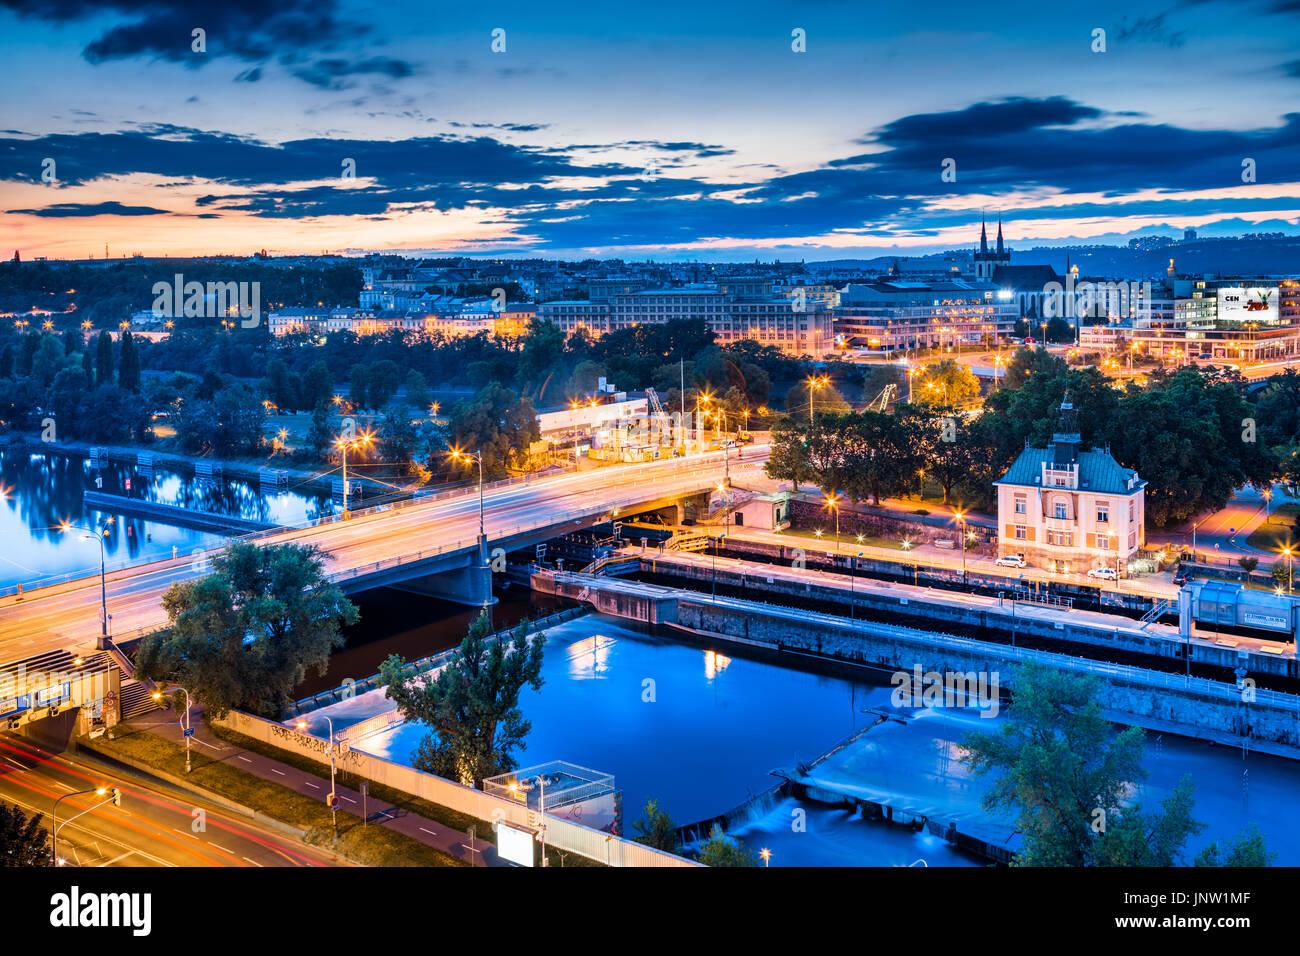 Europe, Czech Republic, Czechia, Prague, Praha, Historical Centre, City Skyline along Vltava River & Stvanice with Church of St. Anthony of Padova - Stock Image